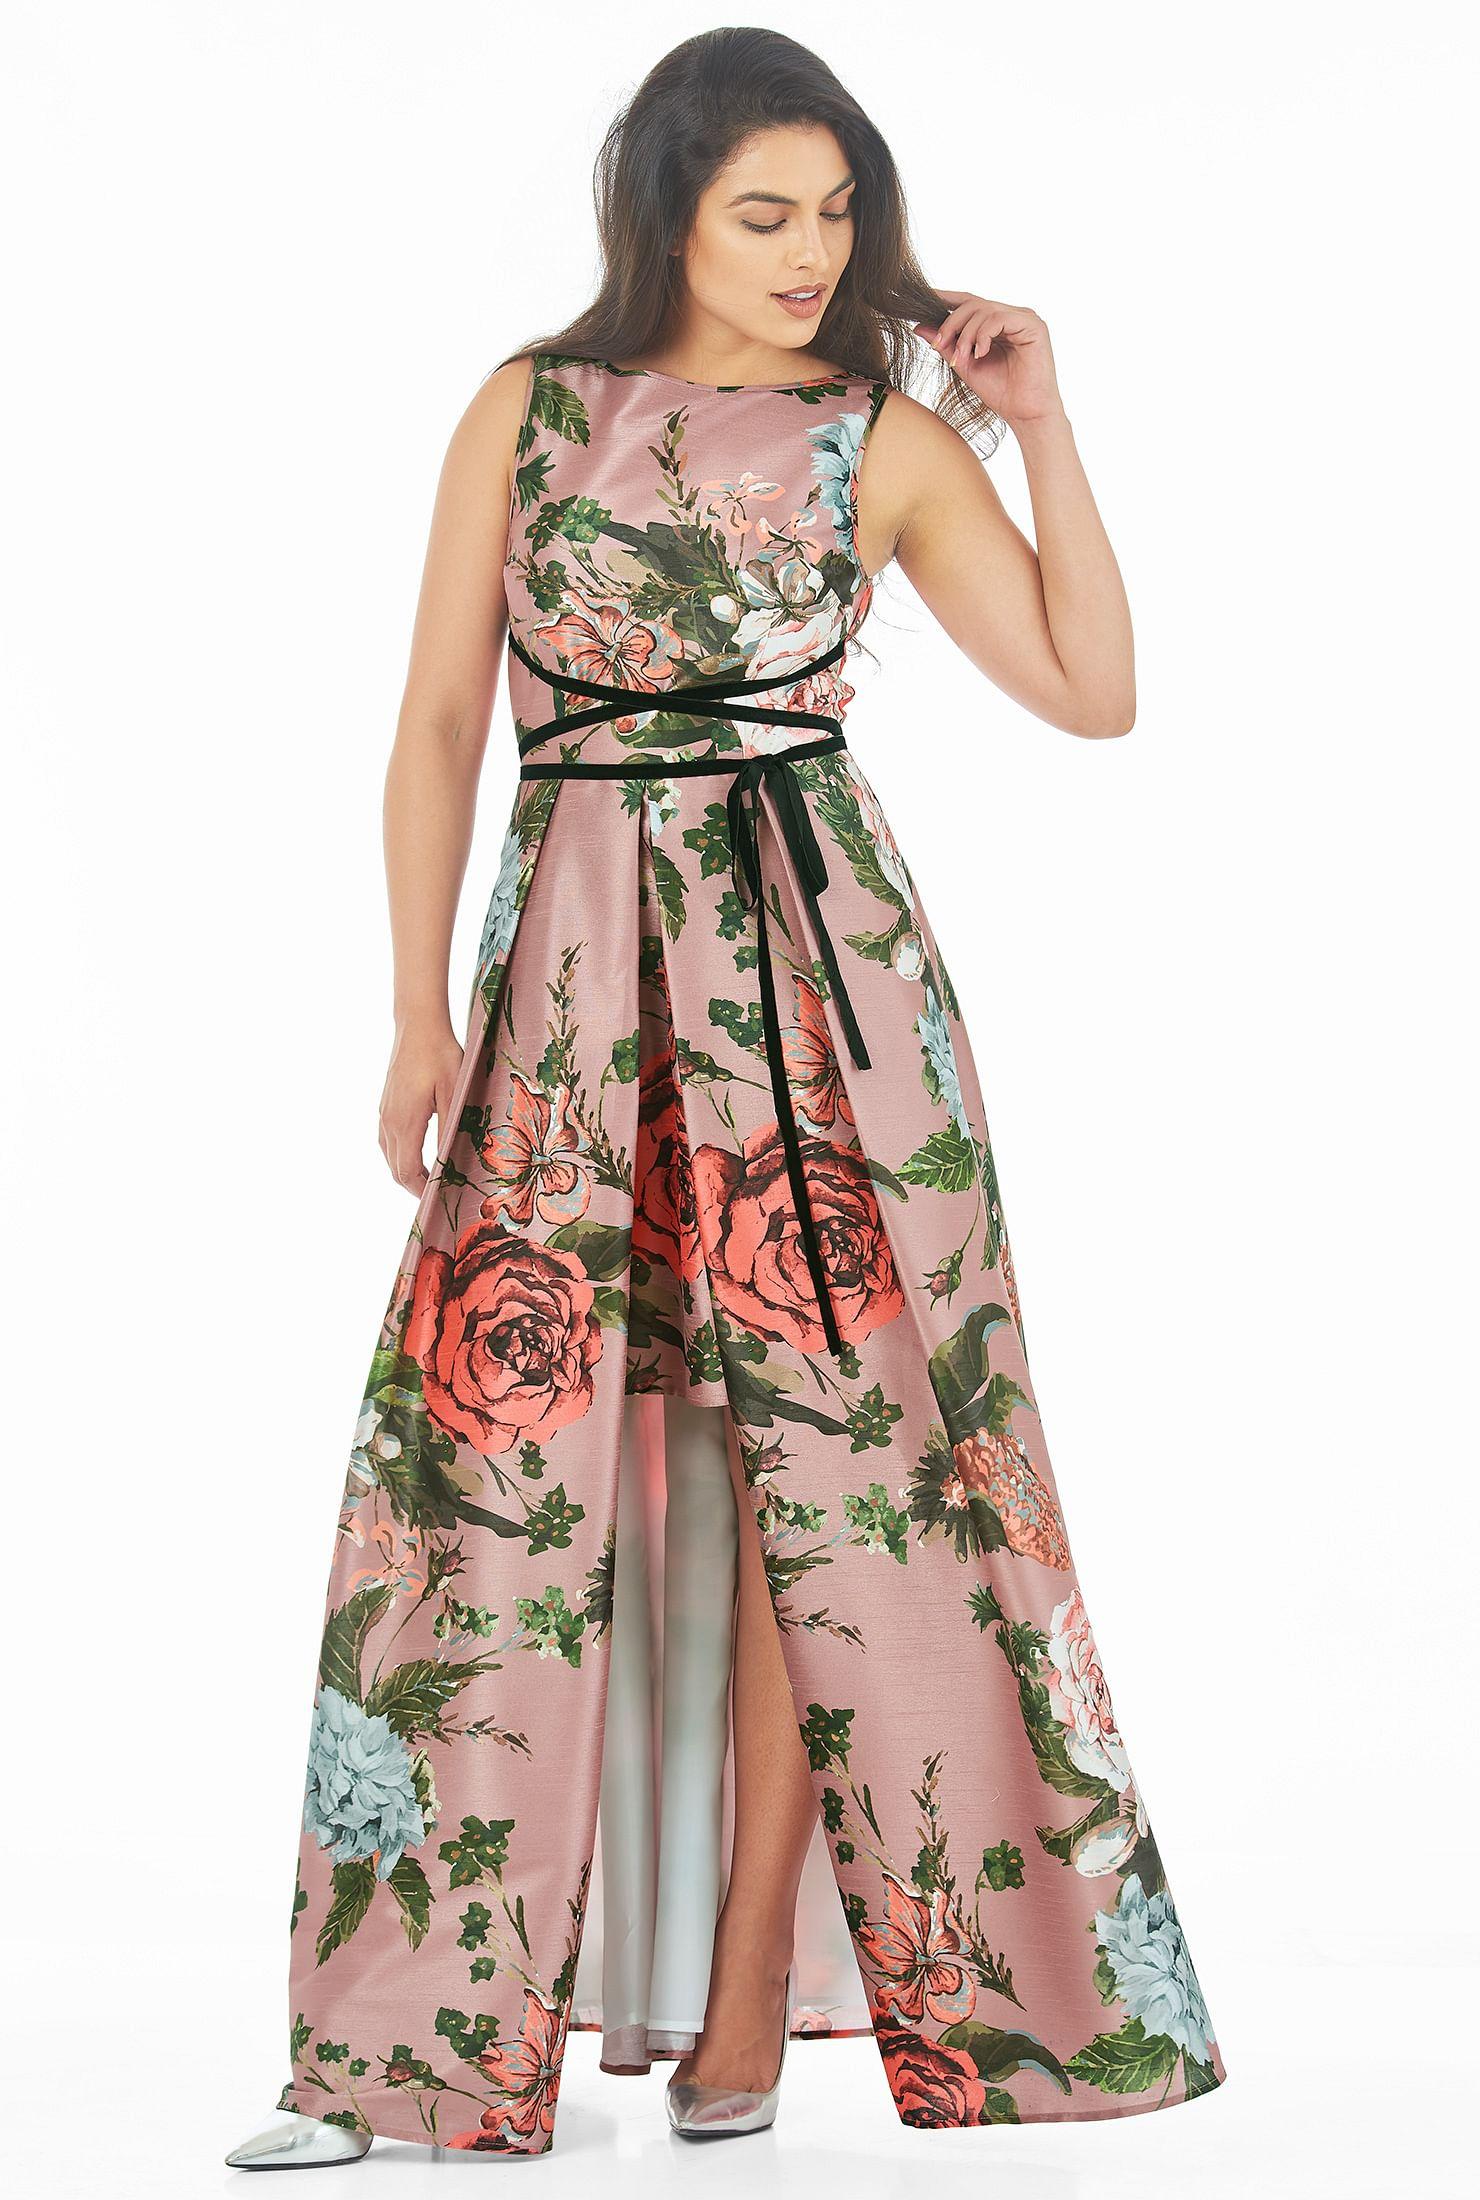 Modish Custom Dusty Rose Dress Midi Dusty Rose Dress Sandals Boat Neck Dry Clean Dusty Rose Feminine Fashion Clothing wedding dress Dusty Rose Dress